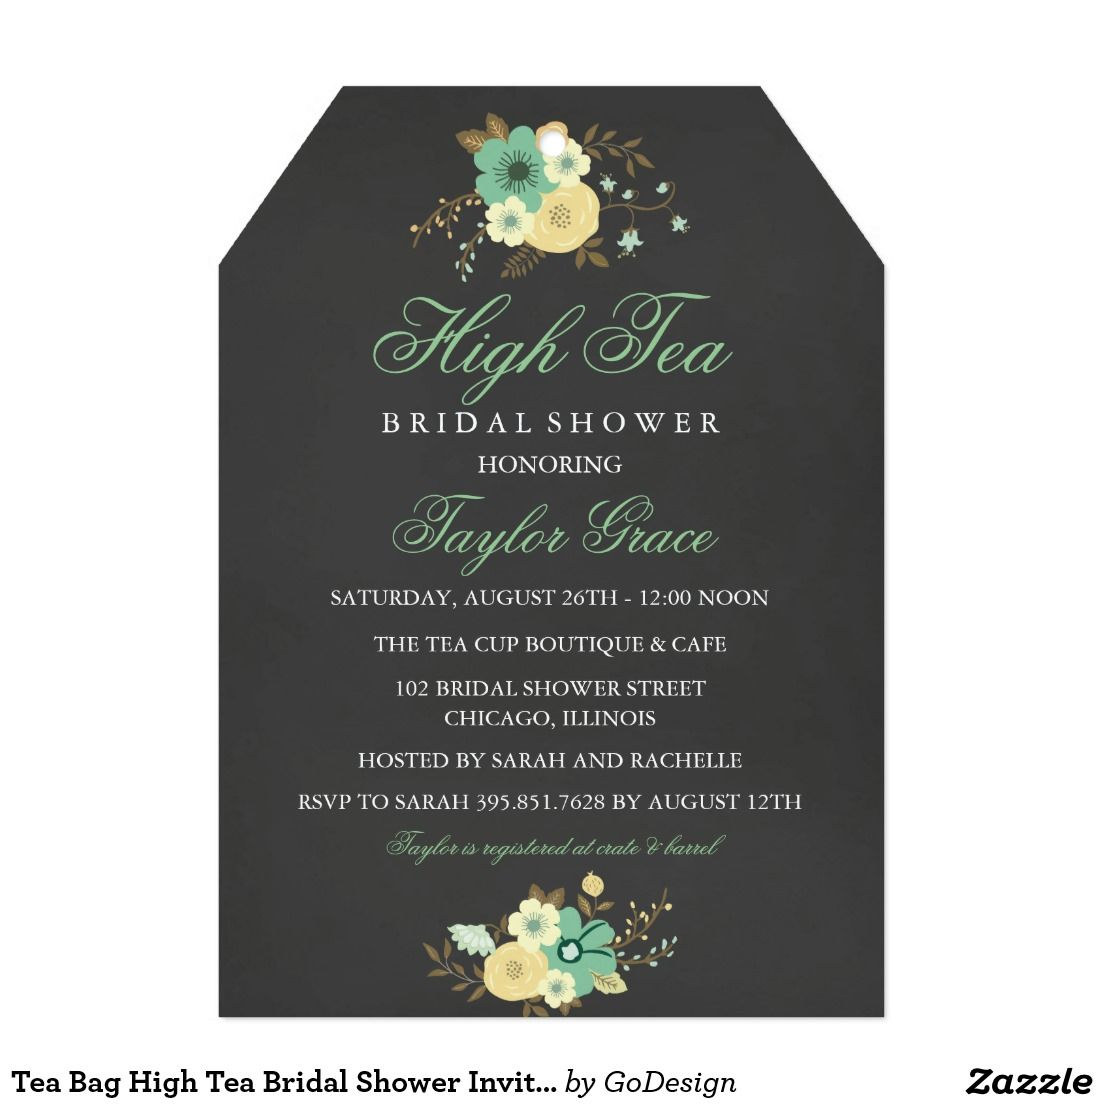 Tea Bag High Tea Bridal Shower Invitation | Pinterest | Tea bridal ...